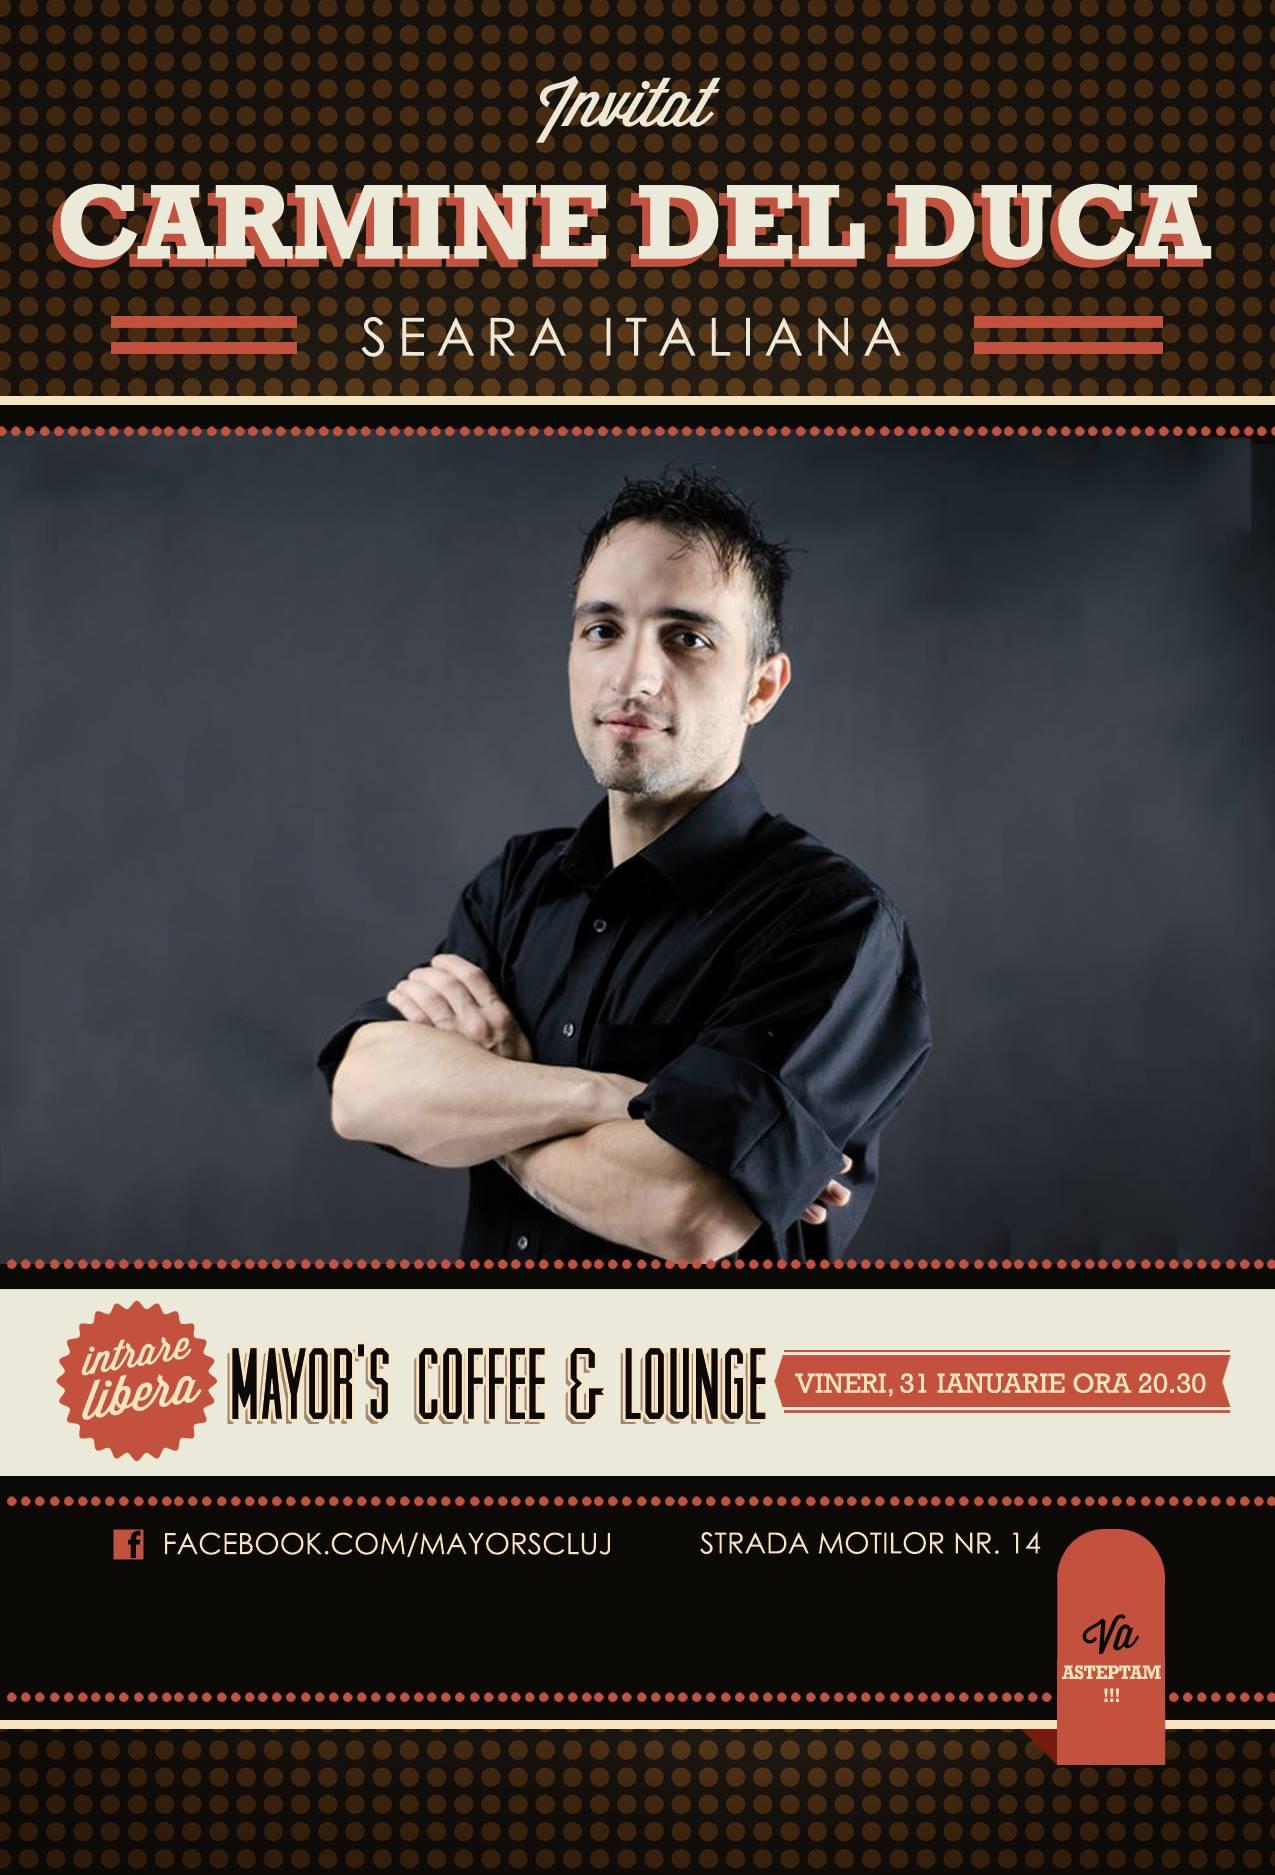 seara italiana mayor's coffe lounge